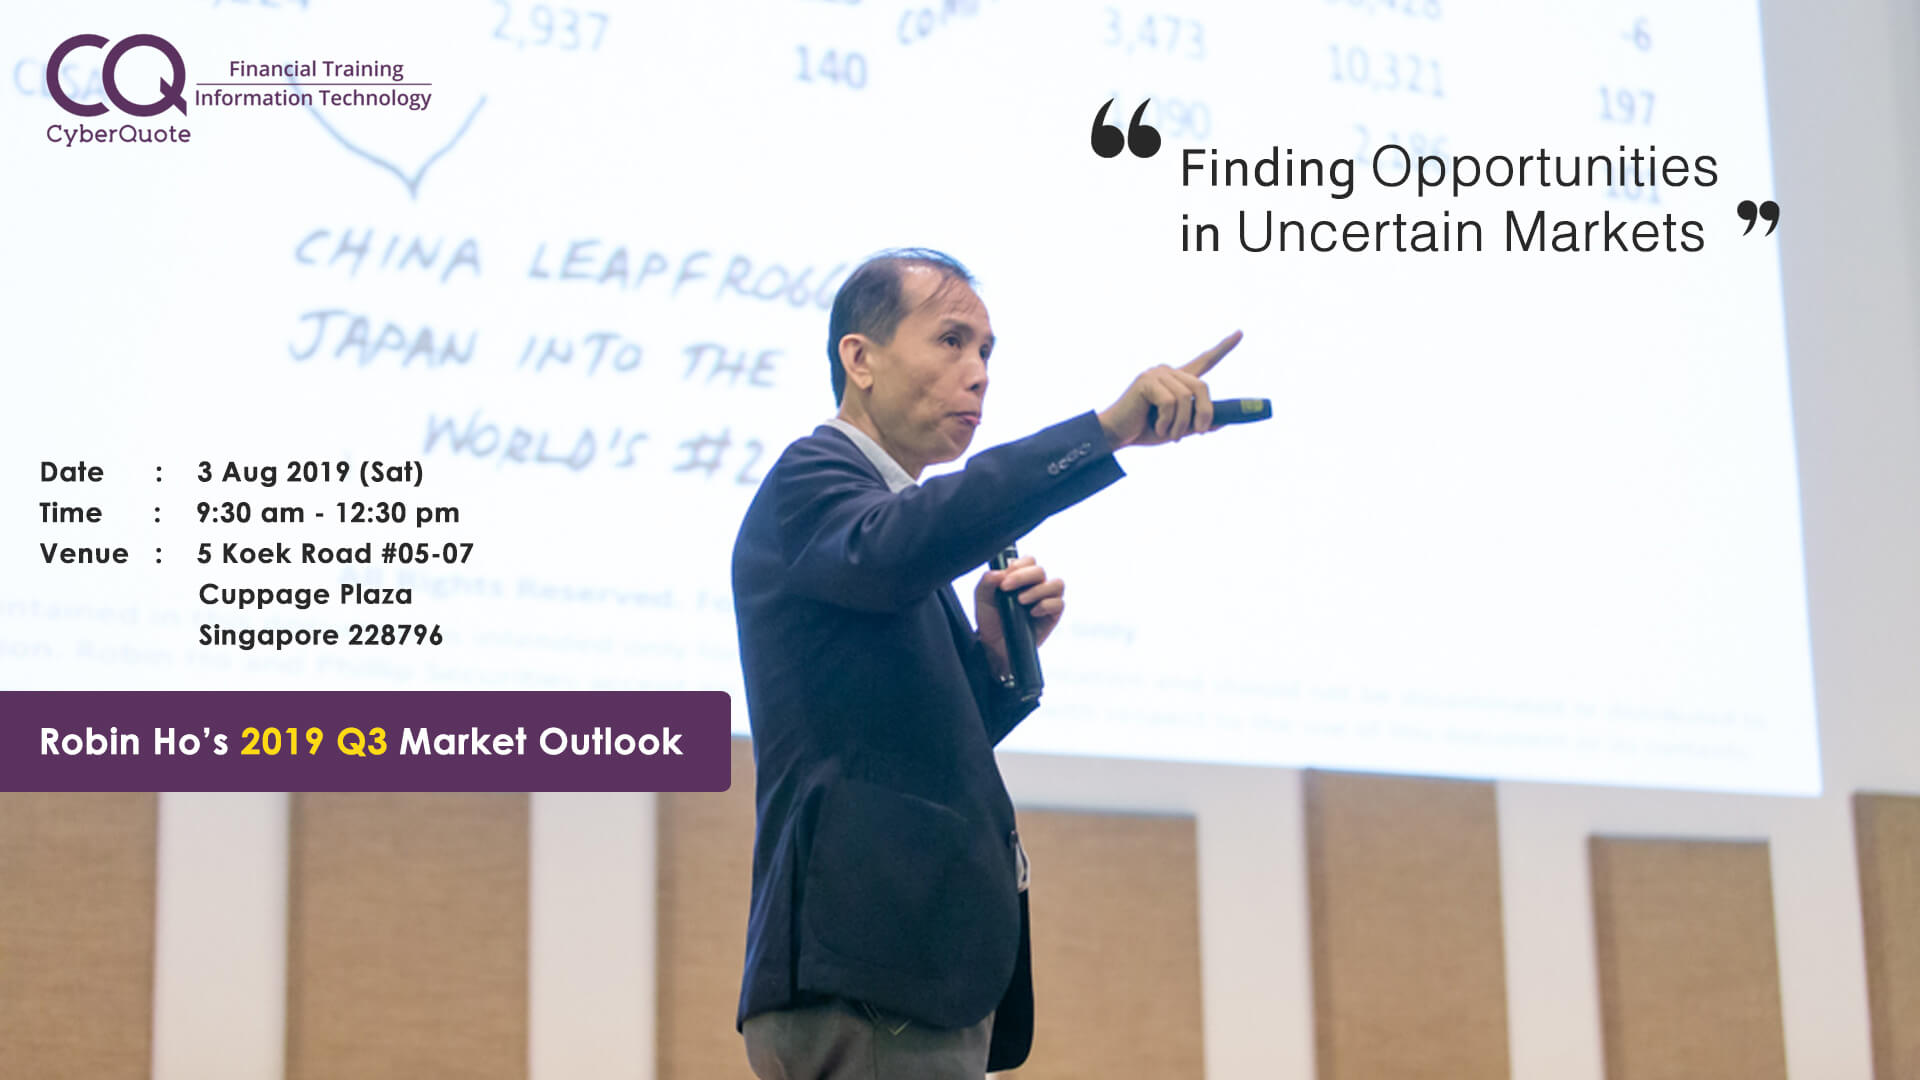 Robin Ho Market Outlook 2019 Q3 FB Event B Side Cover